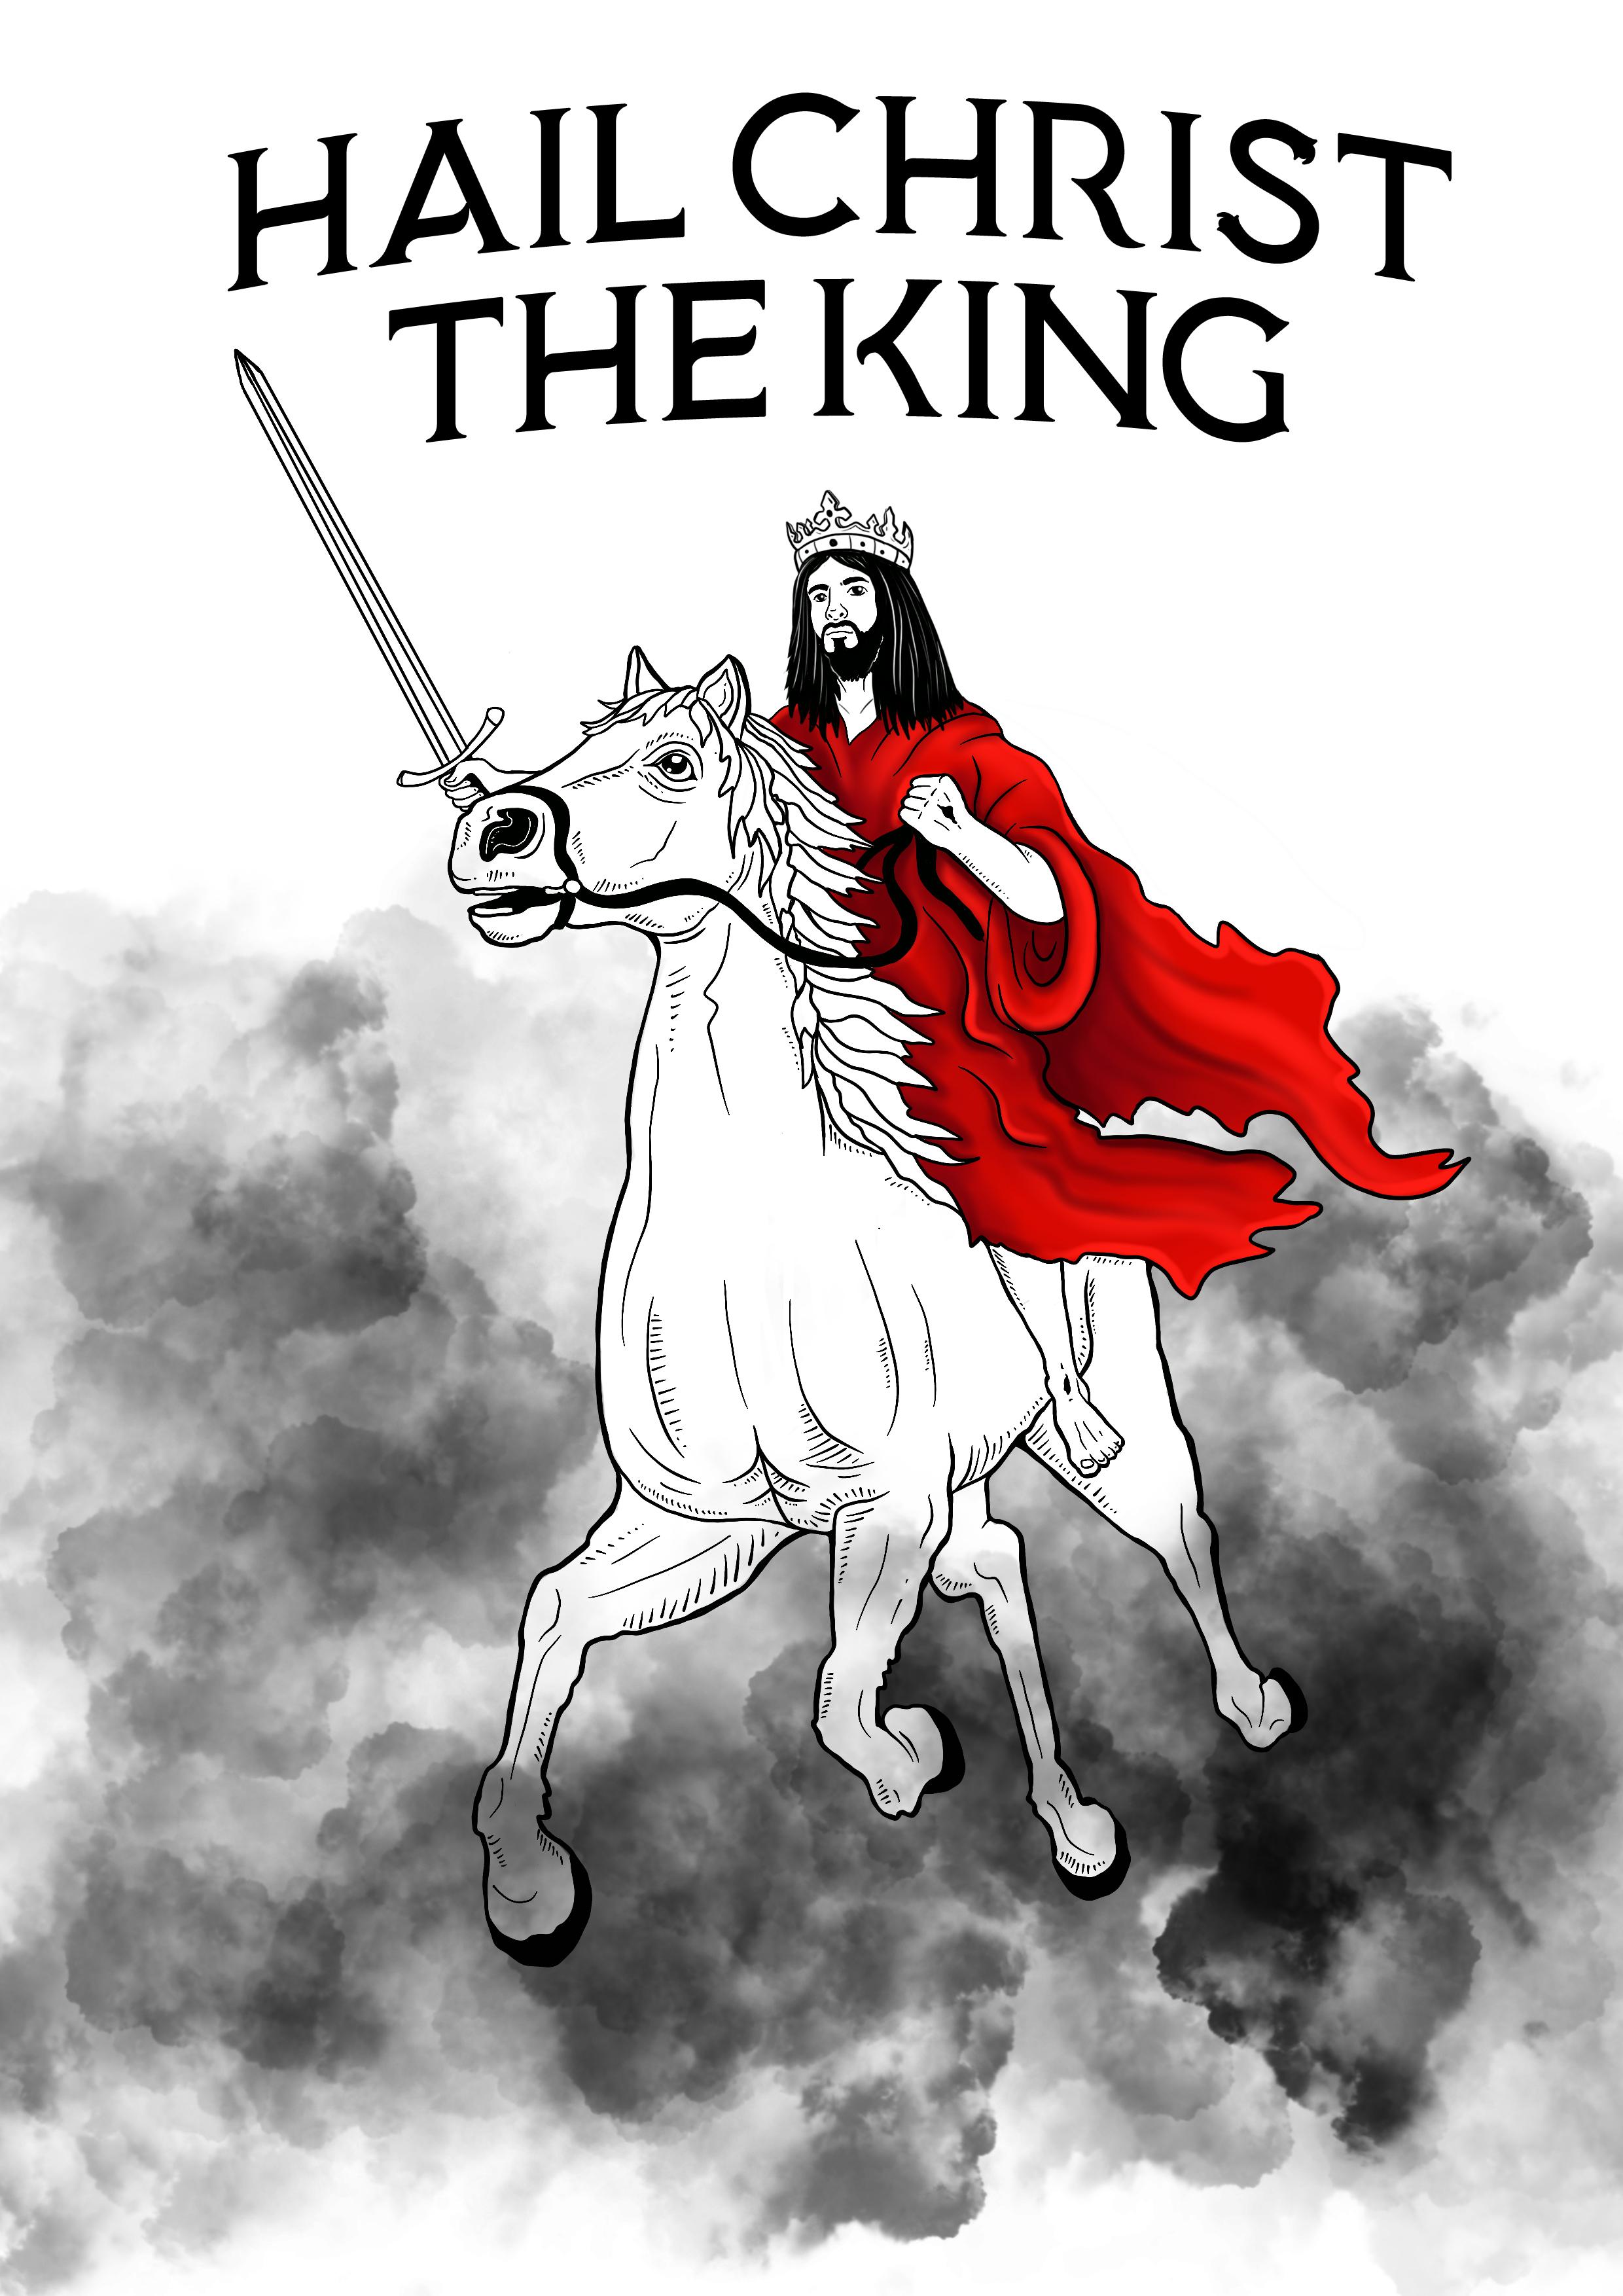 Hail Christ the King